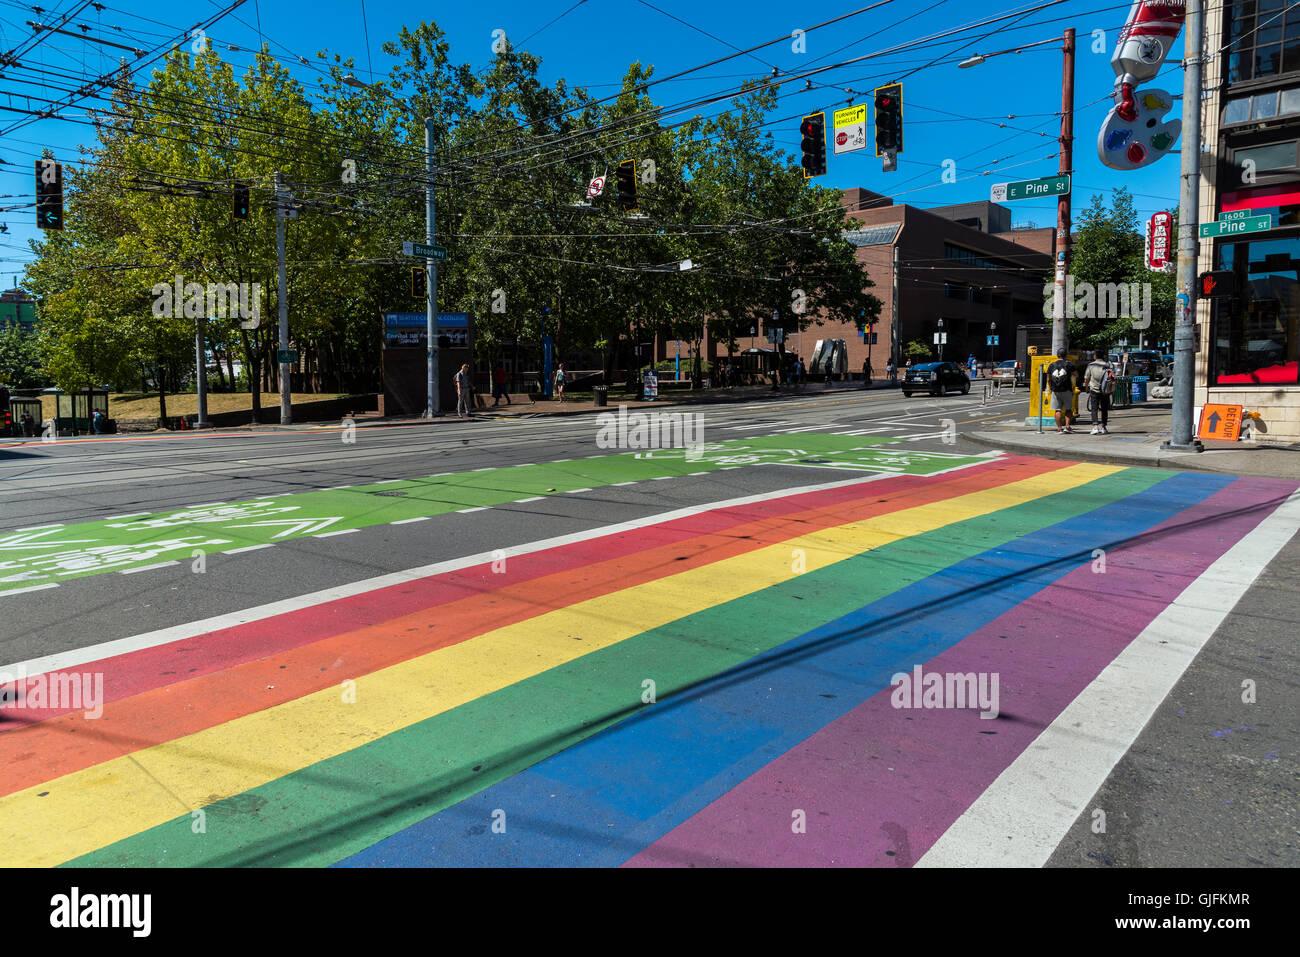 Gay-themed rainbow crosswalk in Capitol Hill district, Seattle, Washington, USA - Stock Image